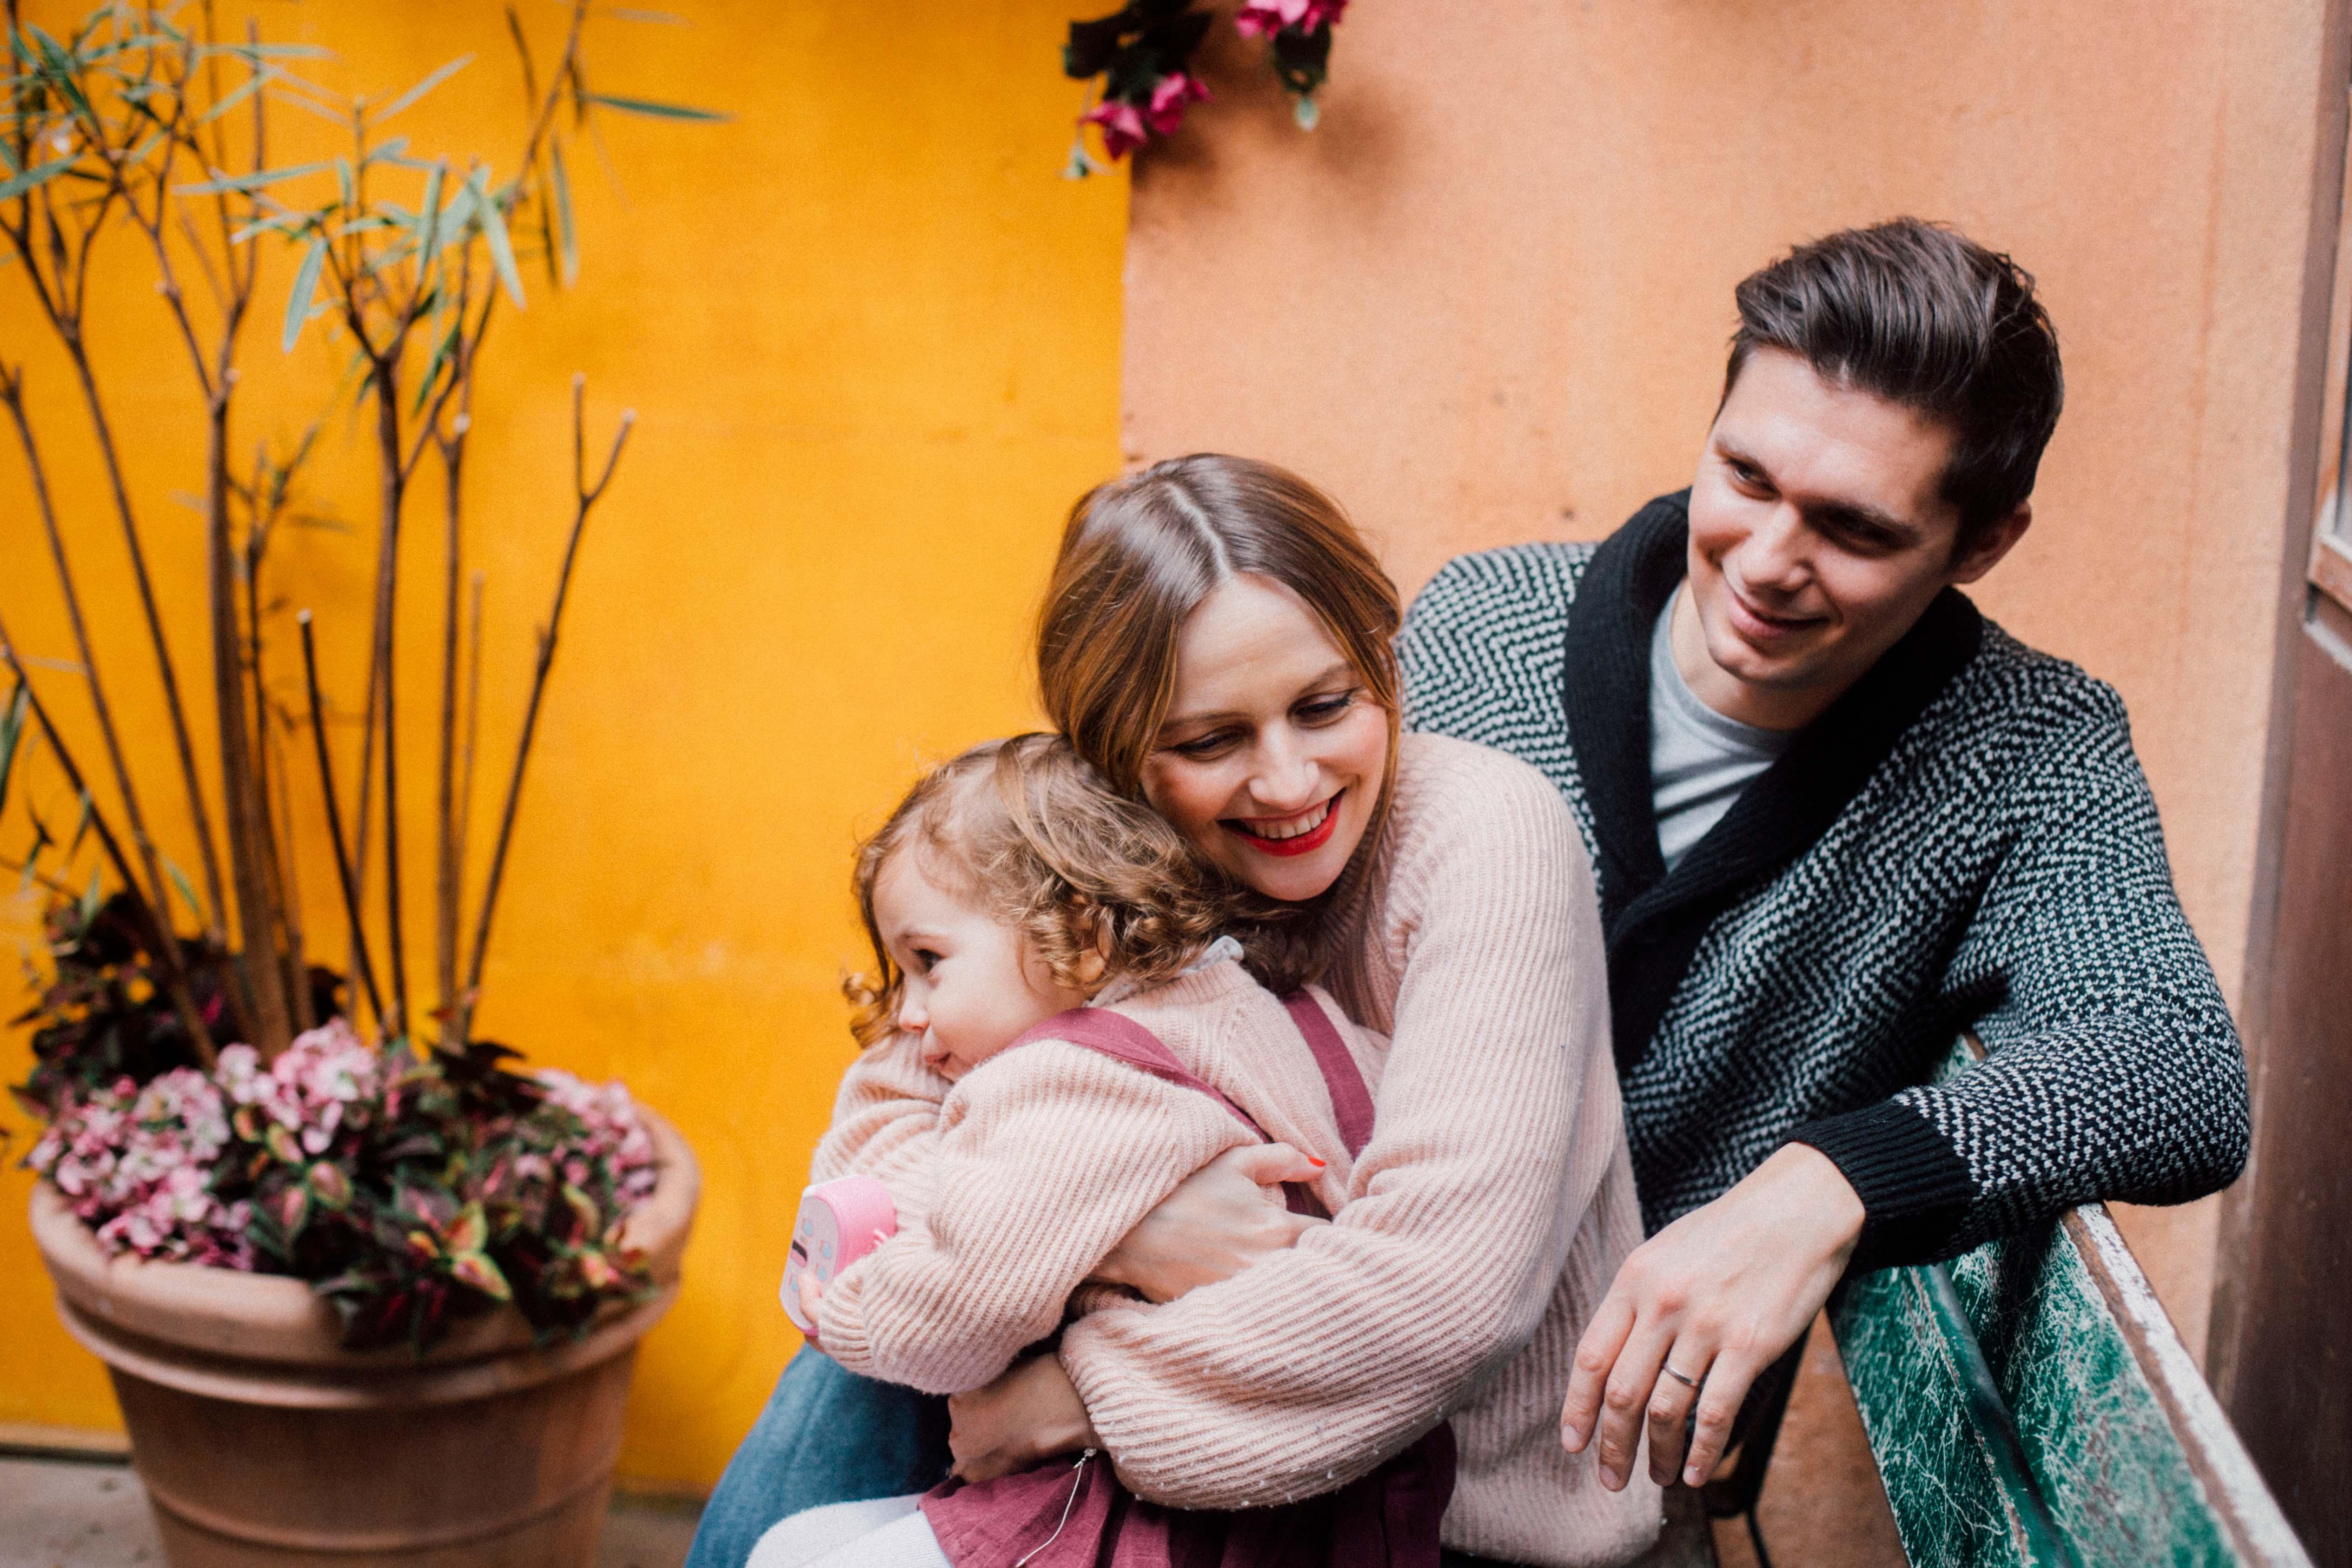 Séance photo amoureux / famille avec The Tamarind Tree pour withalovelikethat.fr